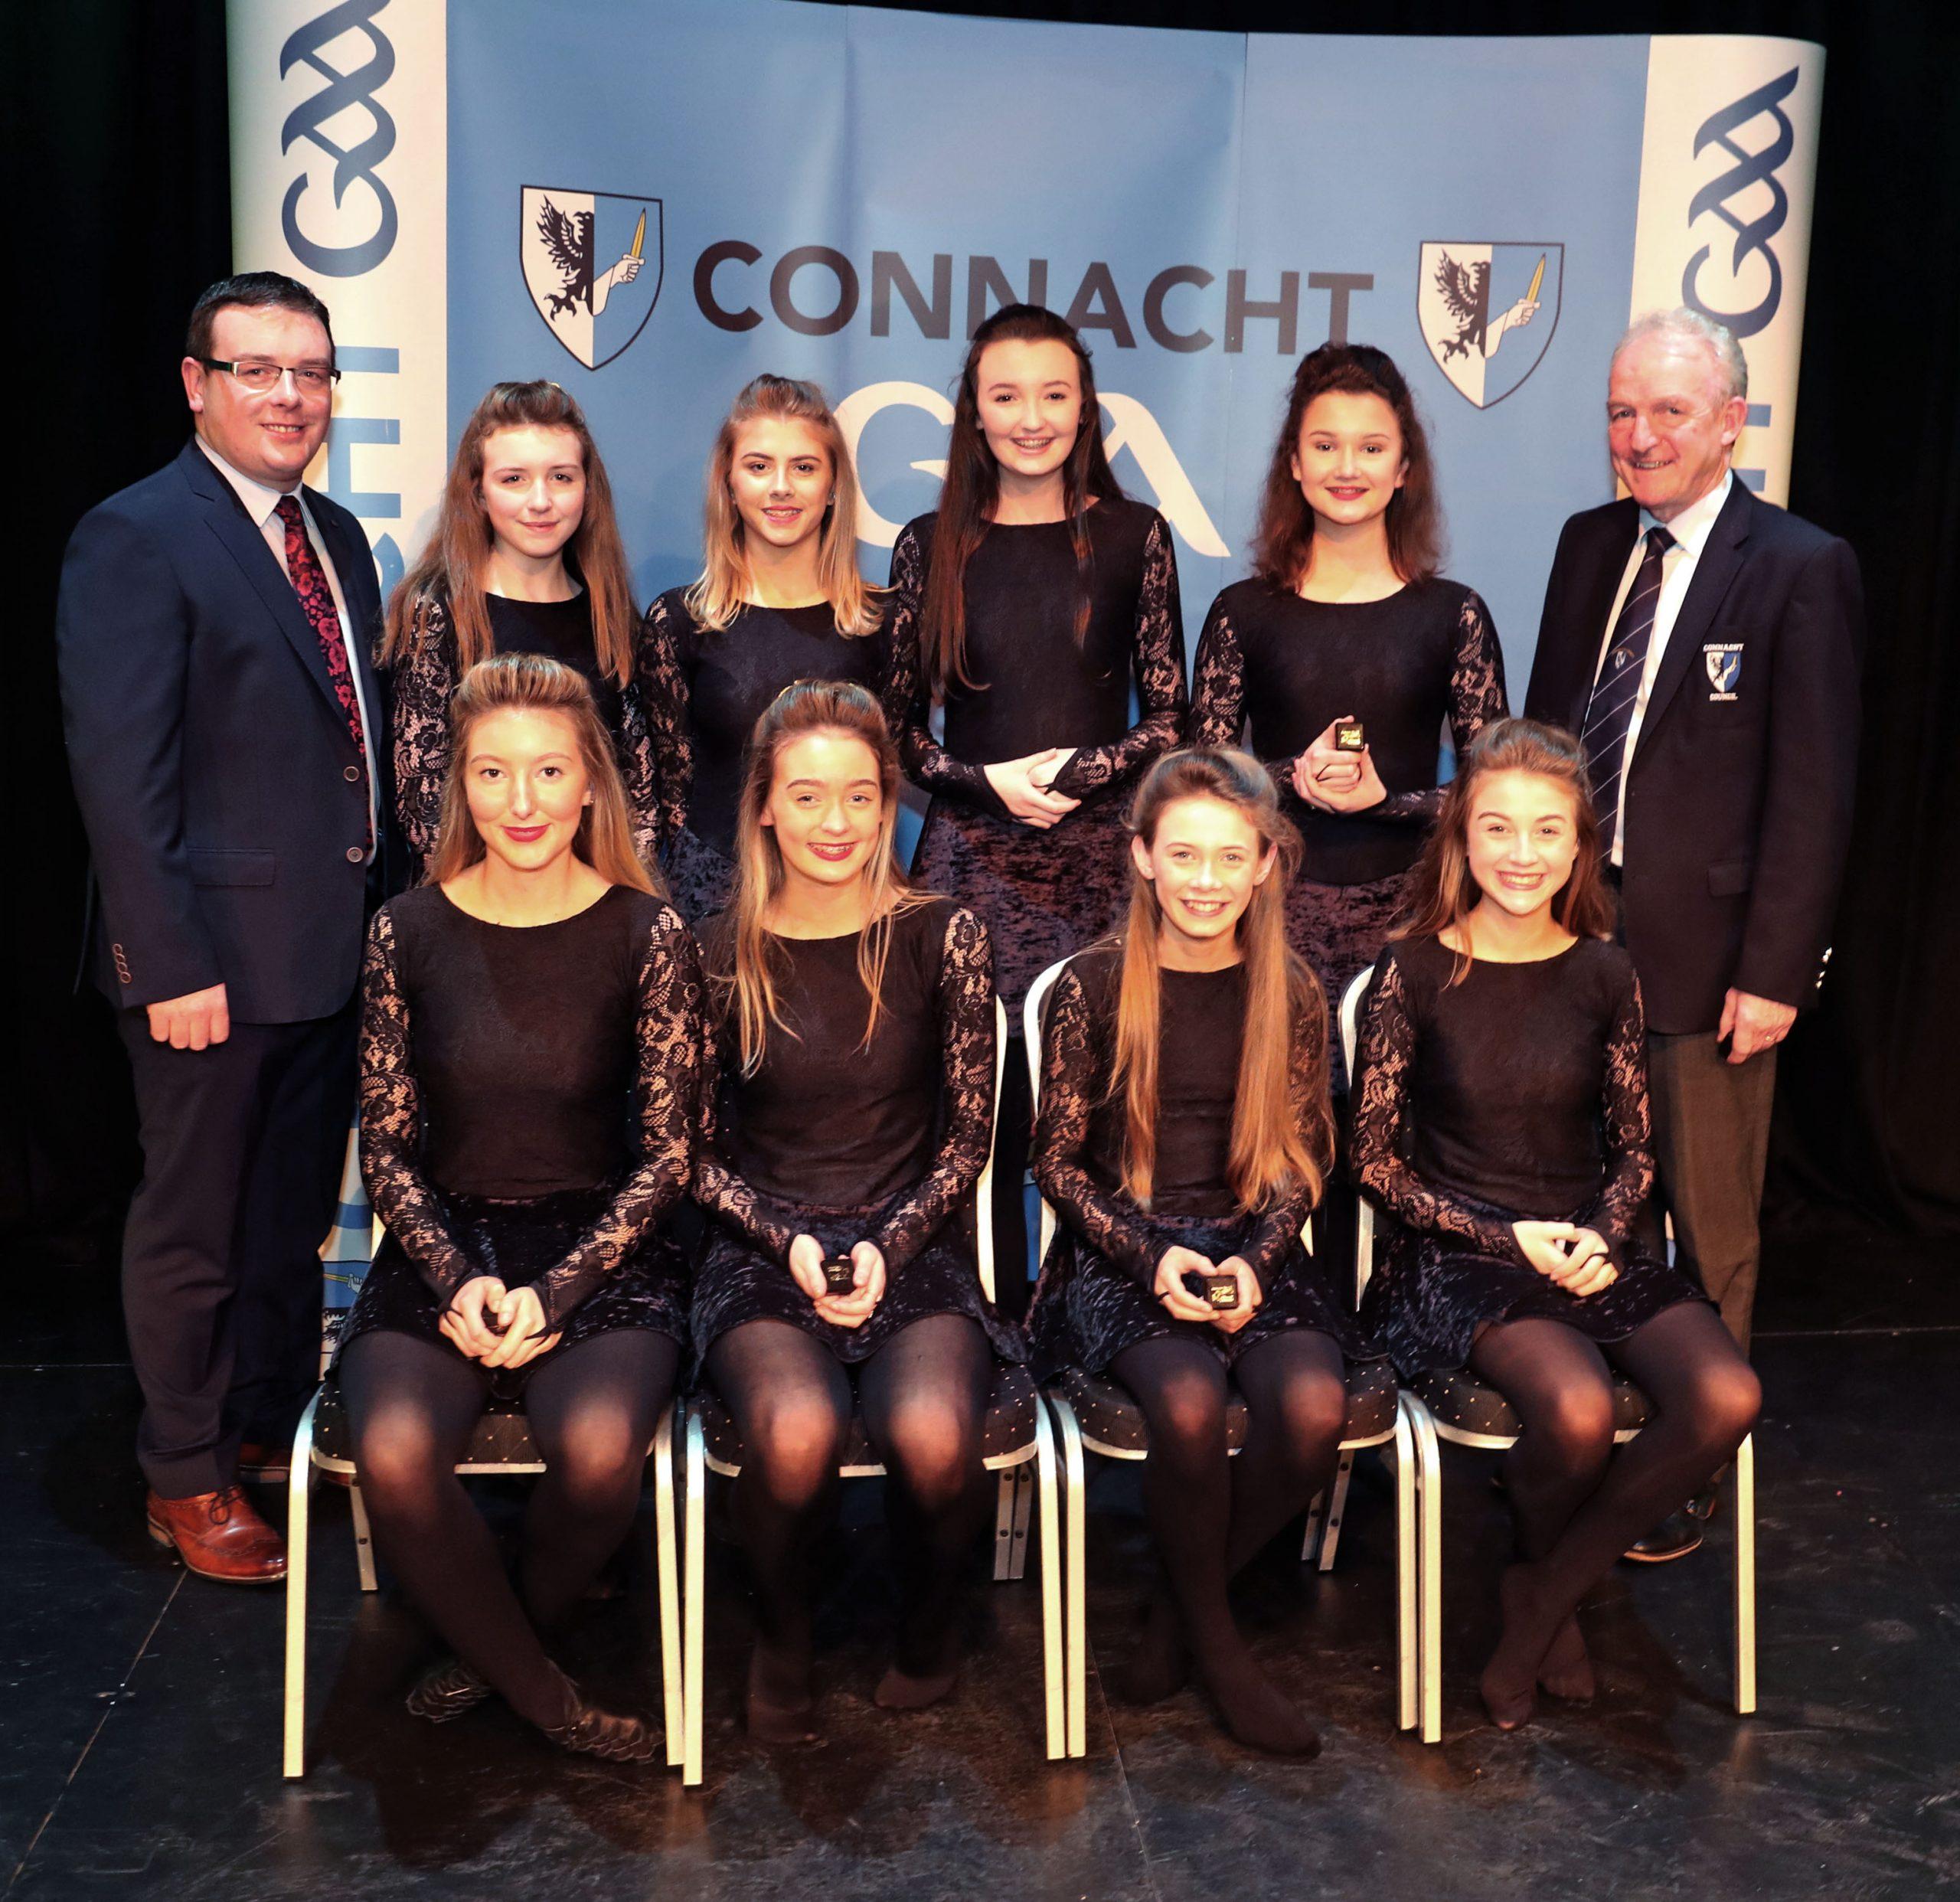 Connacht GAA Scór na nÓg Finals Take Place in Claremorris